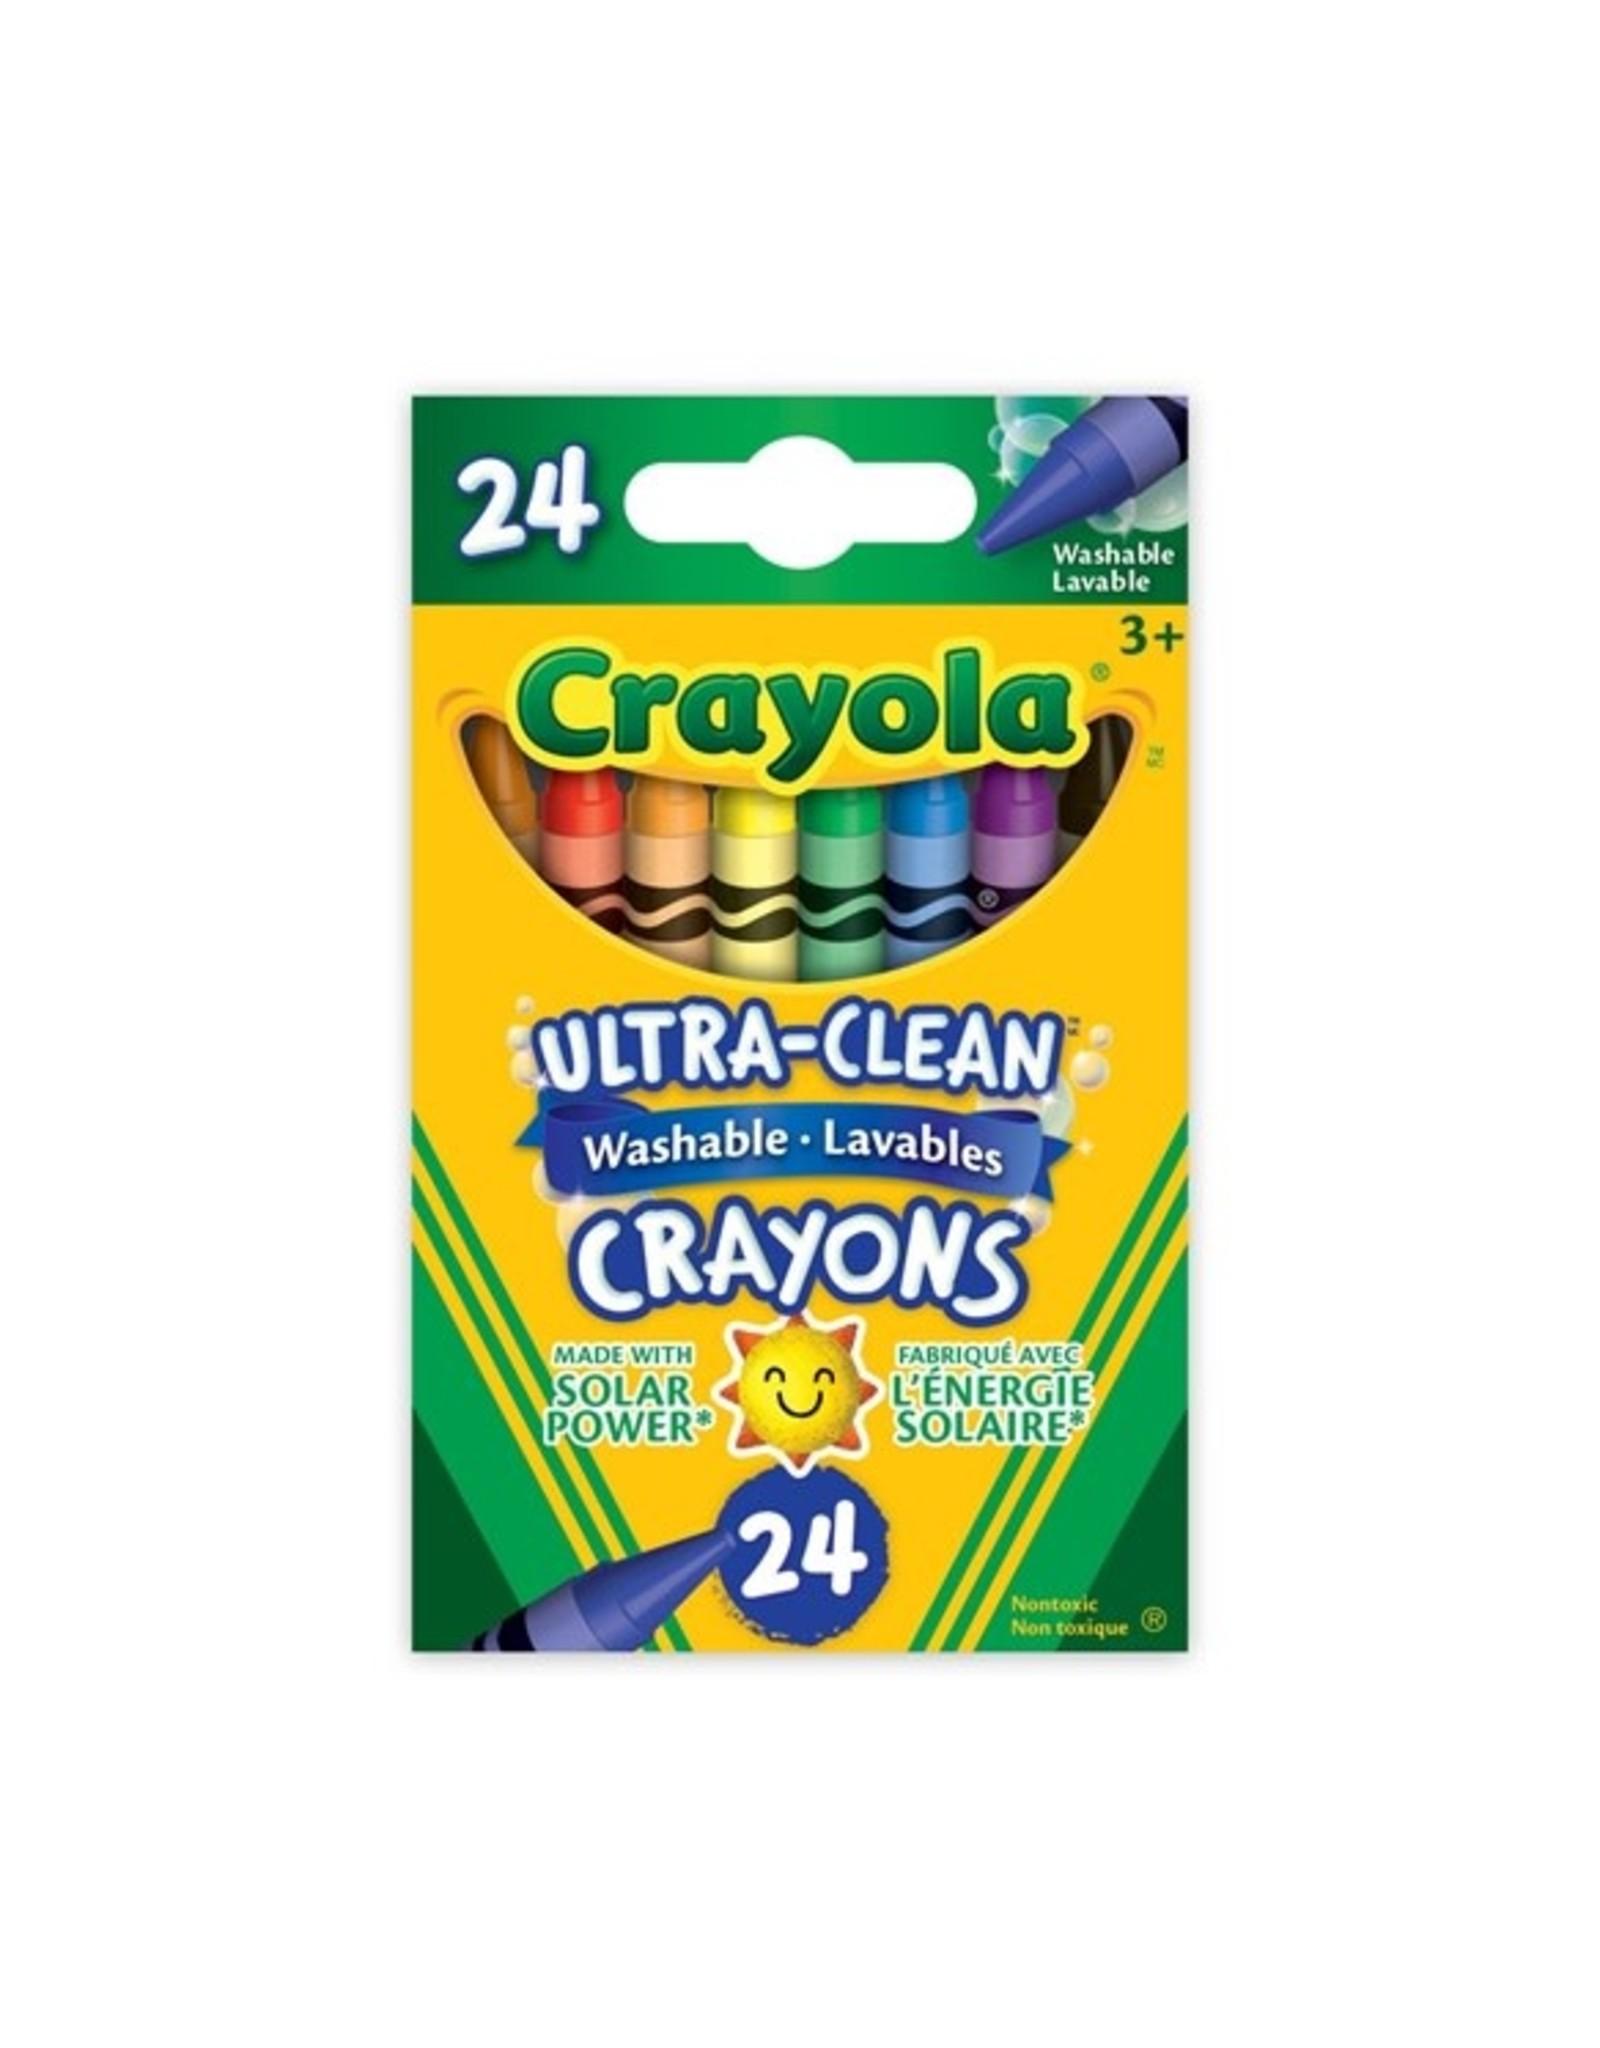 Crayola Ultra Clean Washable Crayons 24pc